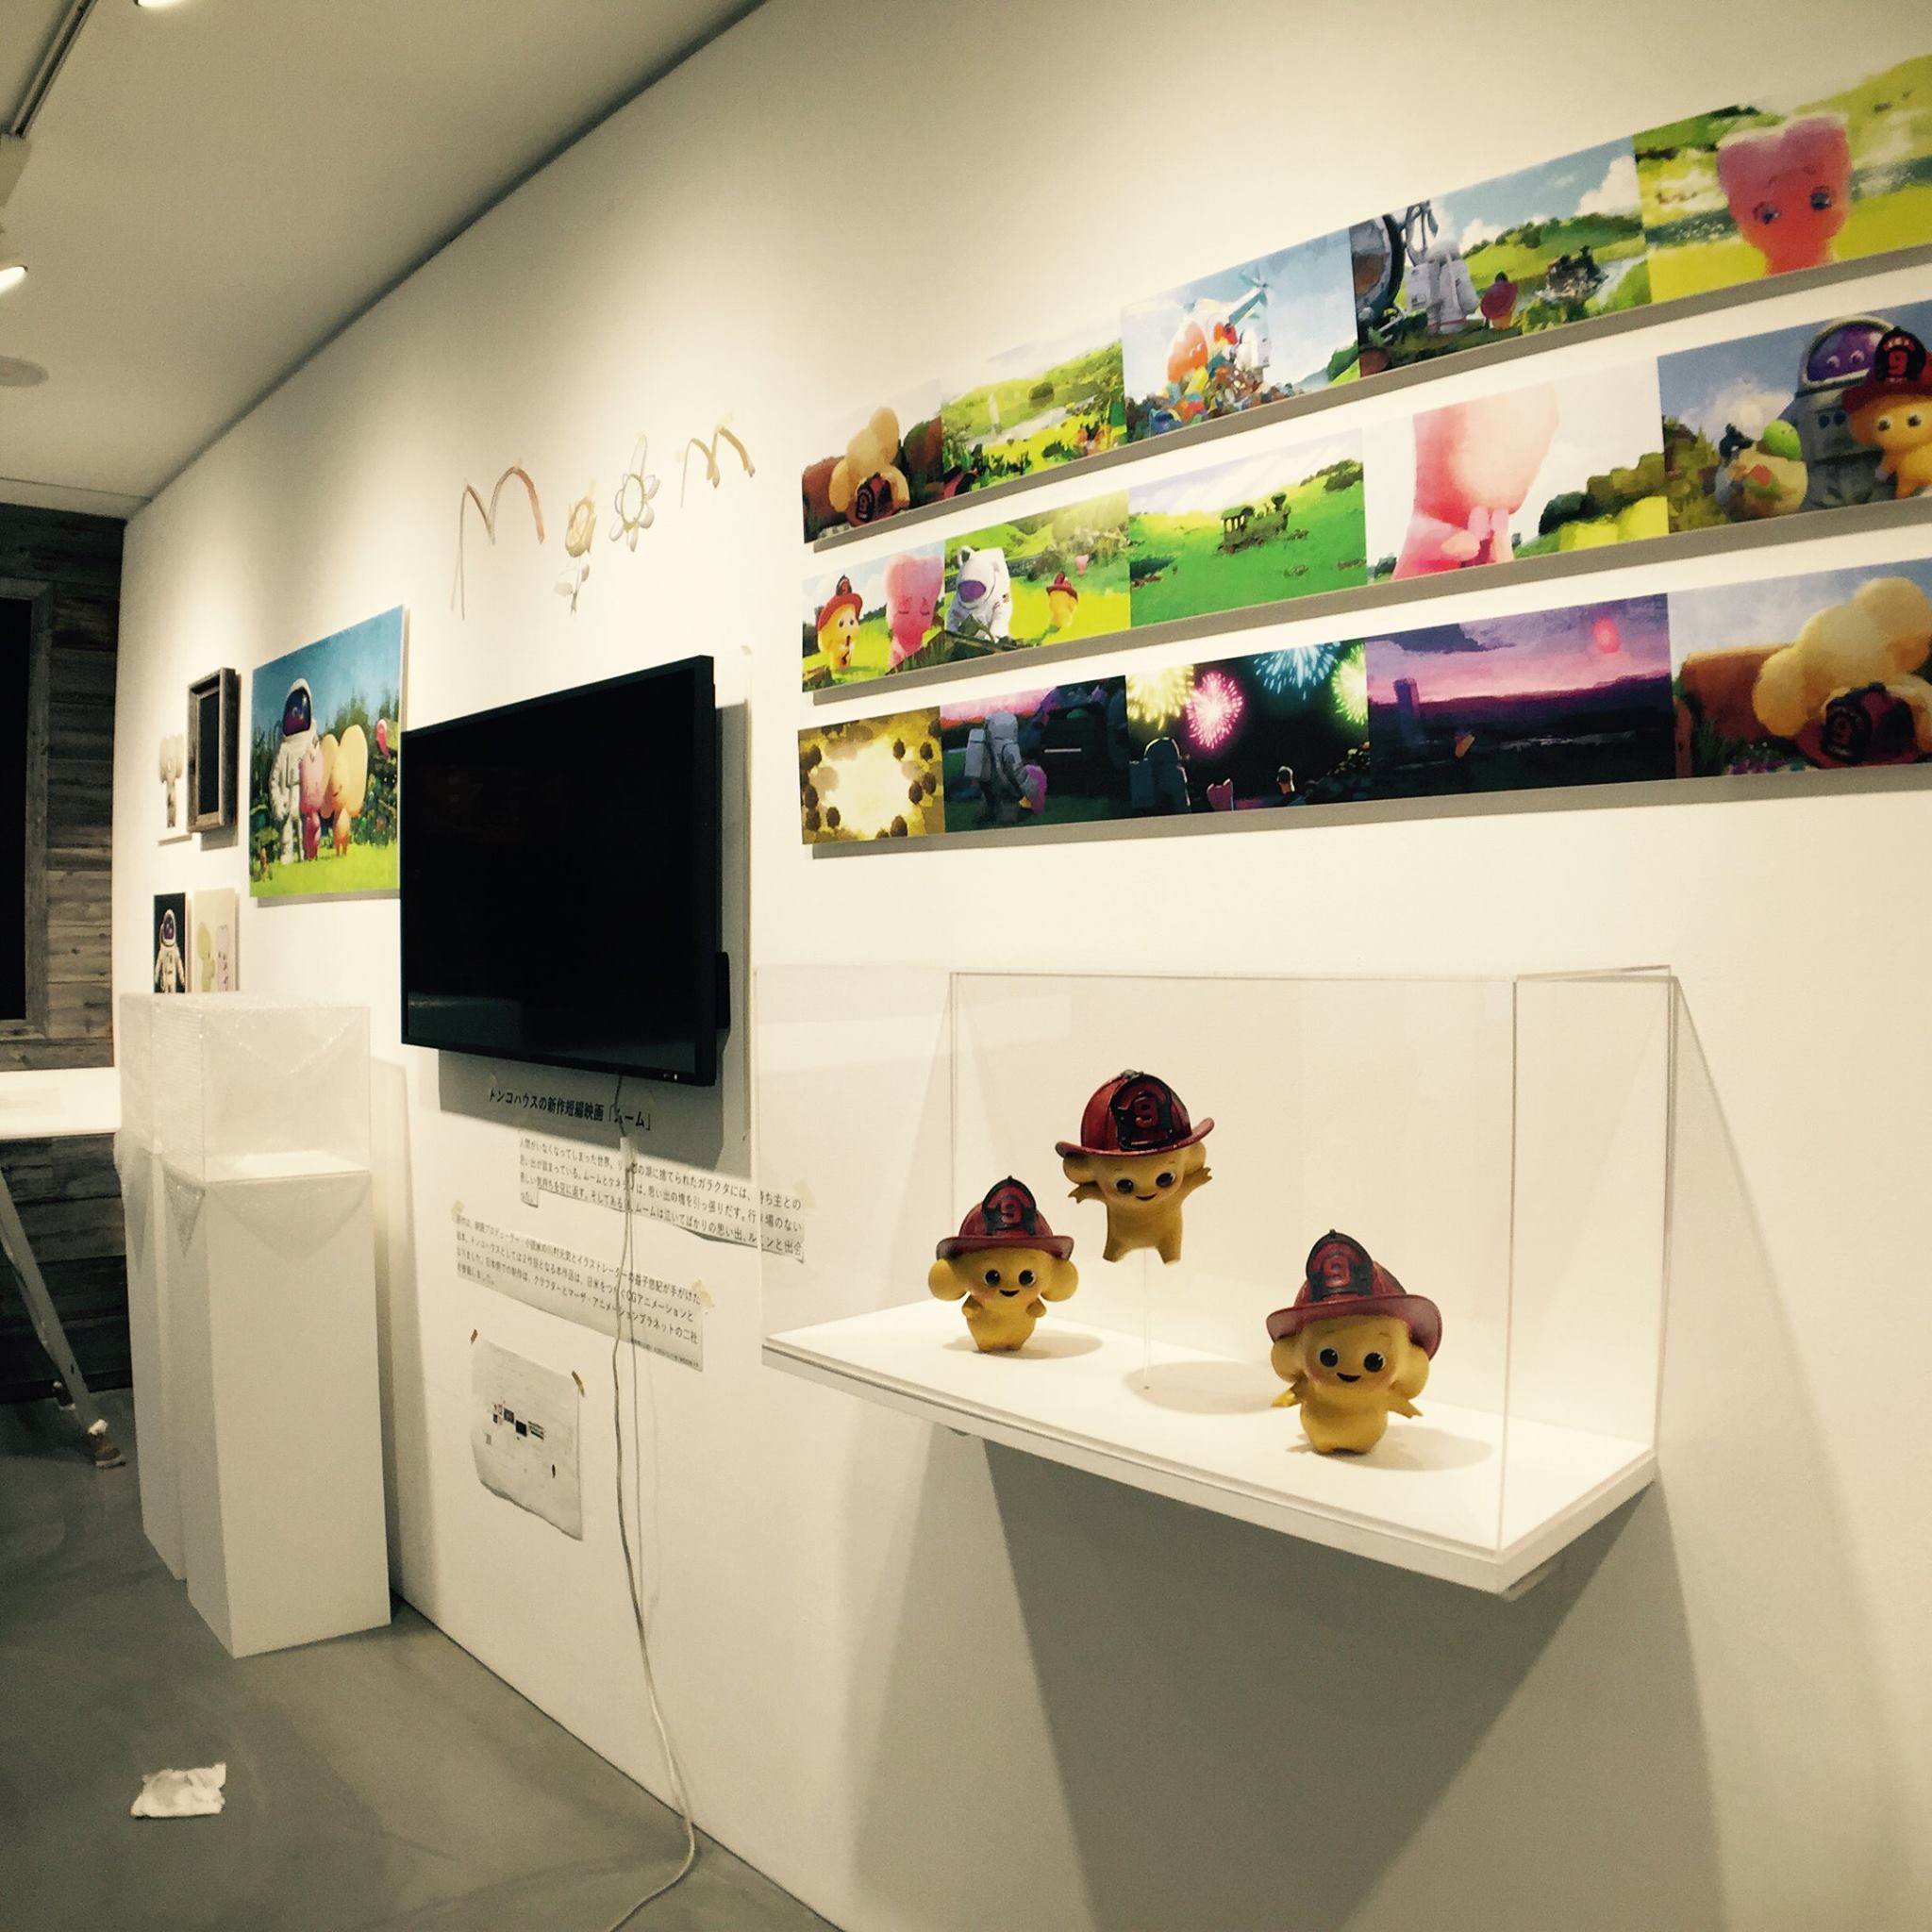 展覽現場,除了跳躍中的 Moom figures,還可以看到 colorscripts 和 concept art 等展品!(pic source)